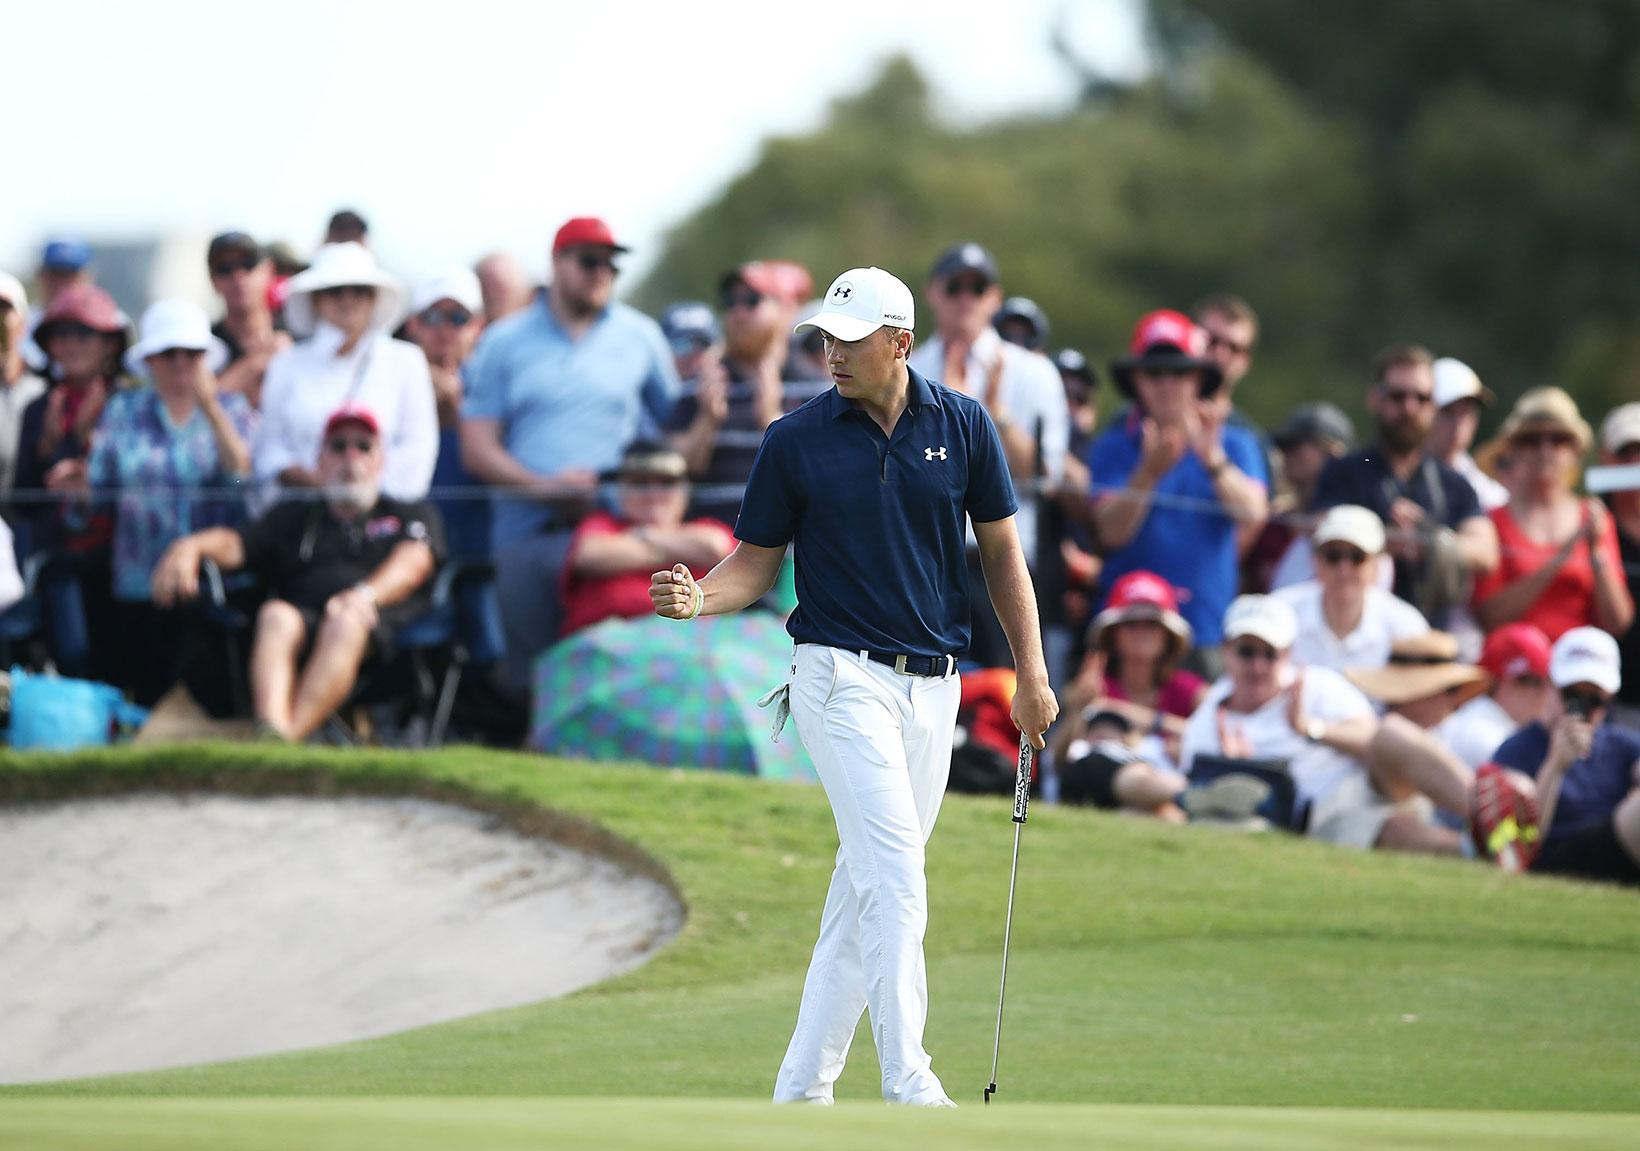 2016 Emirates Australian Open: Final Round - Jordan Holes His Birdie Putt on No. 17 in Regulation